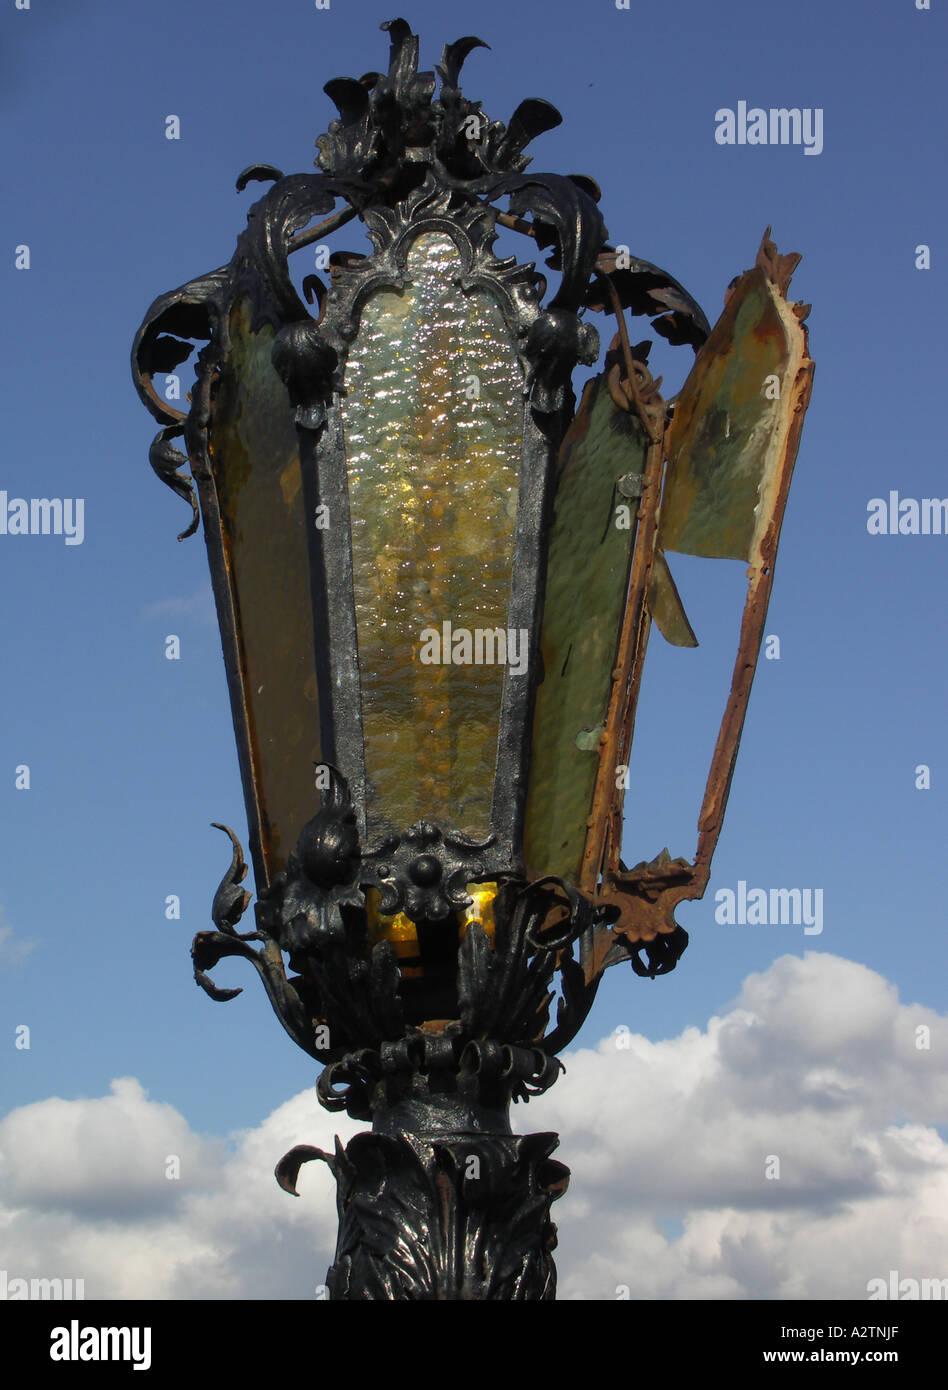 Old broken lamp, detail - Stock Image